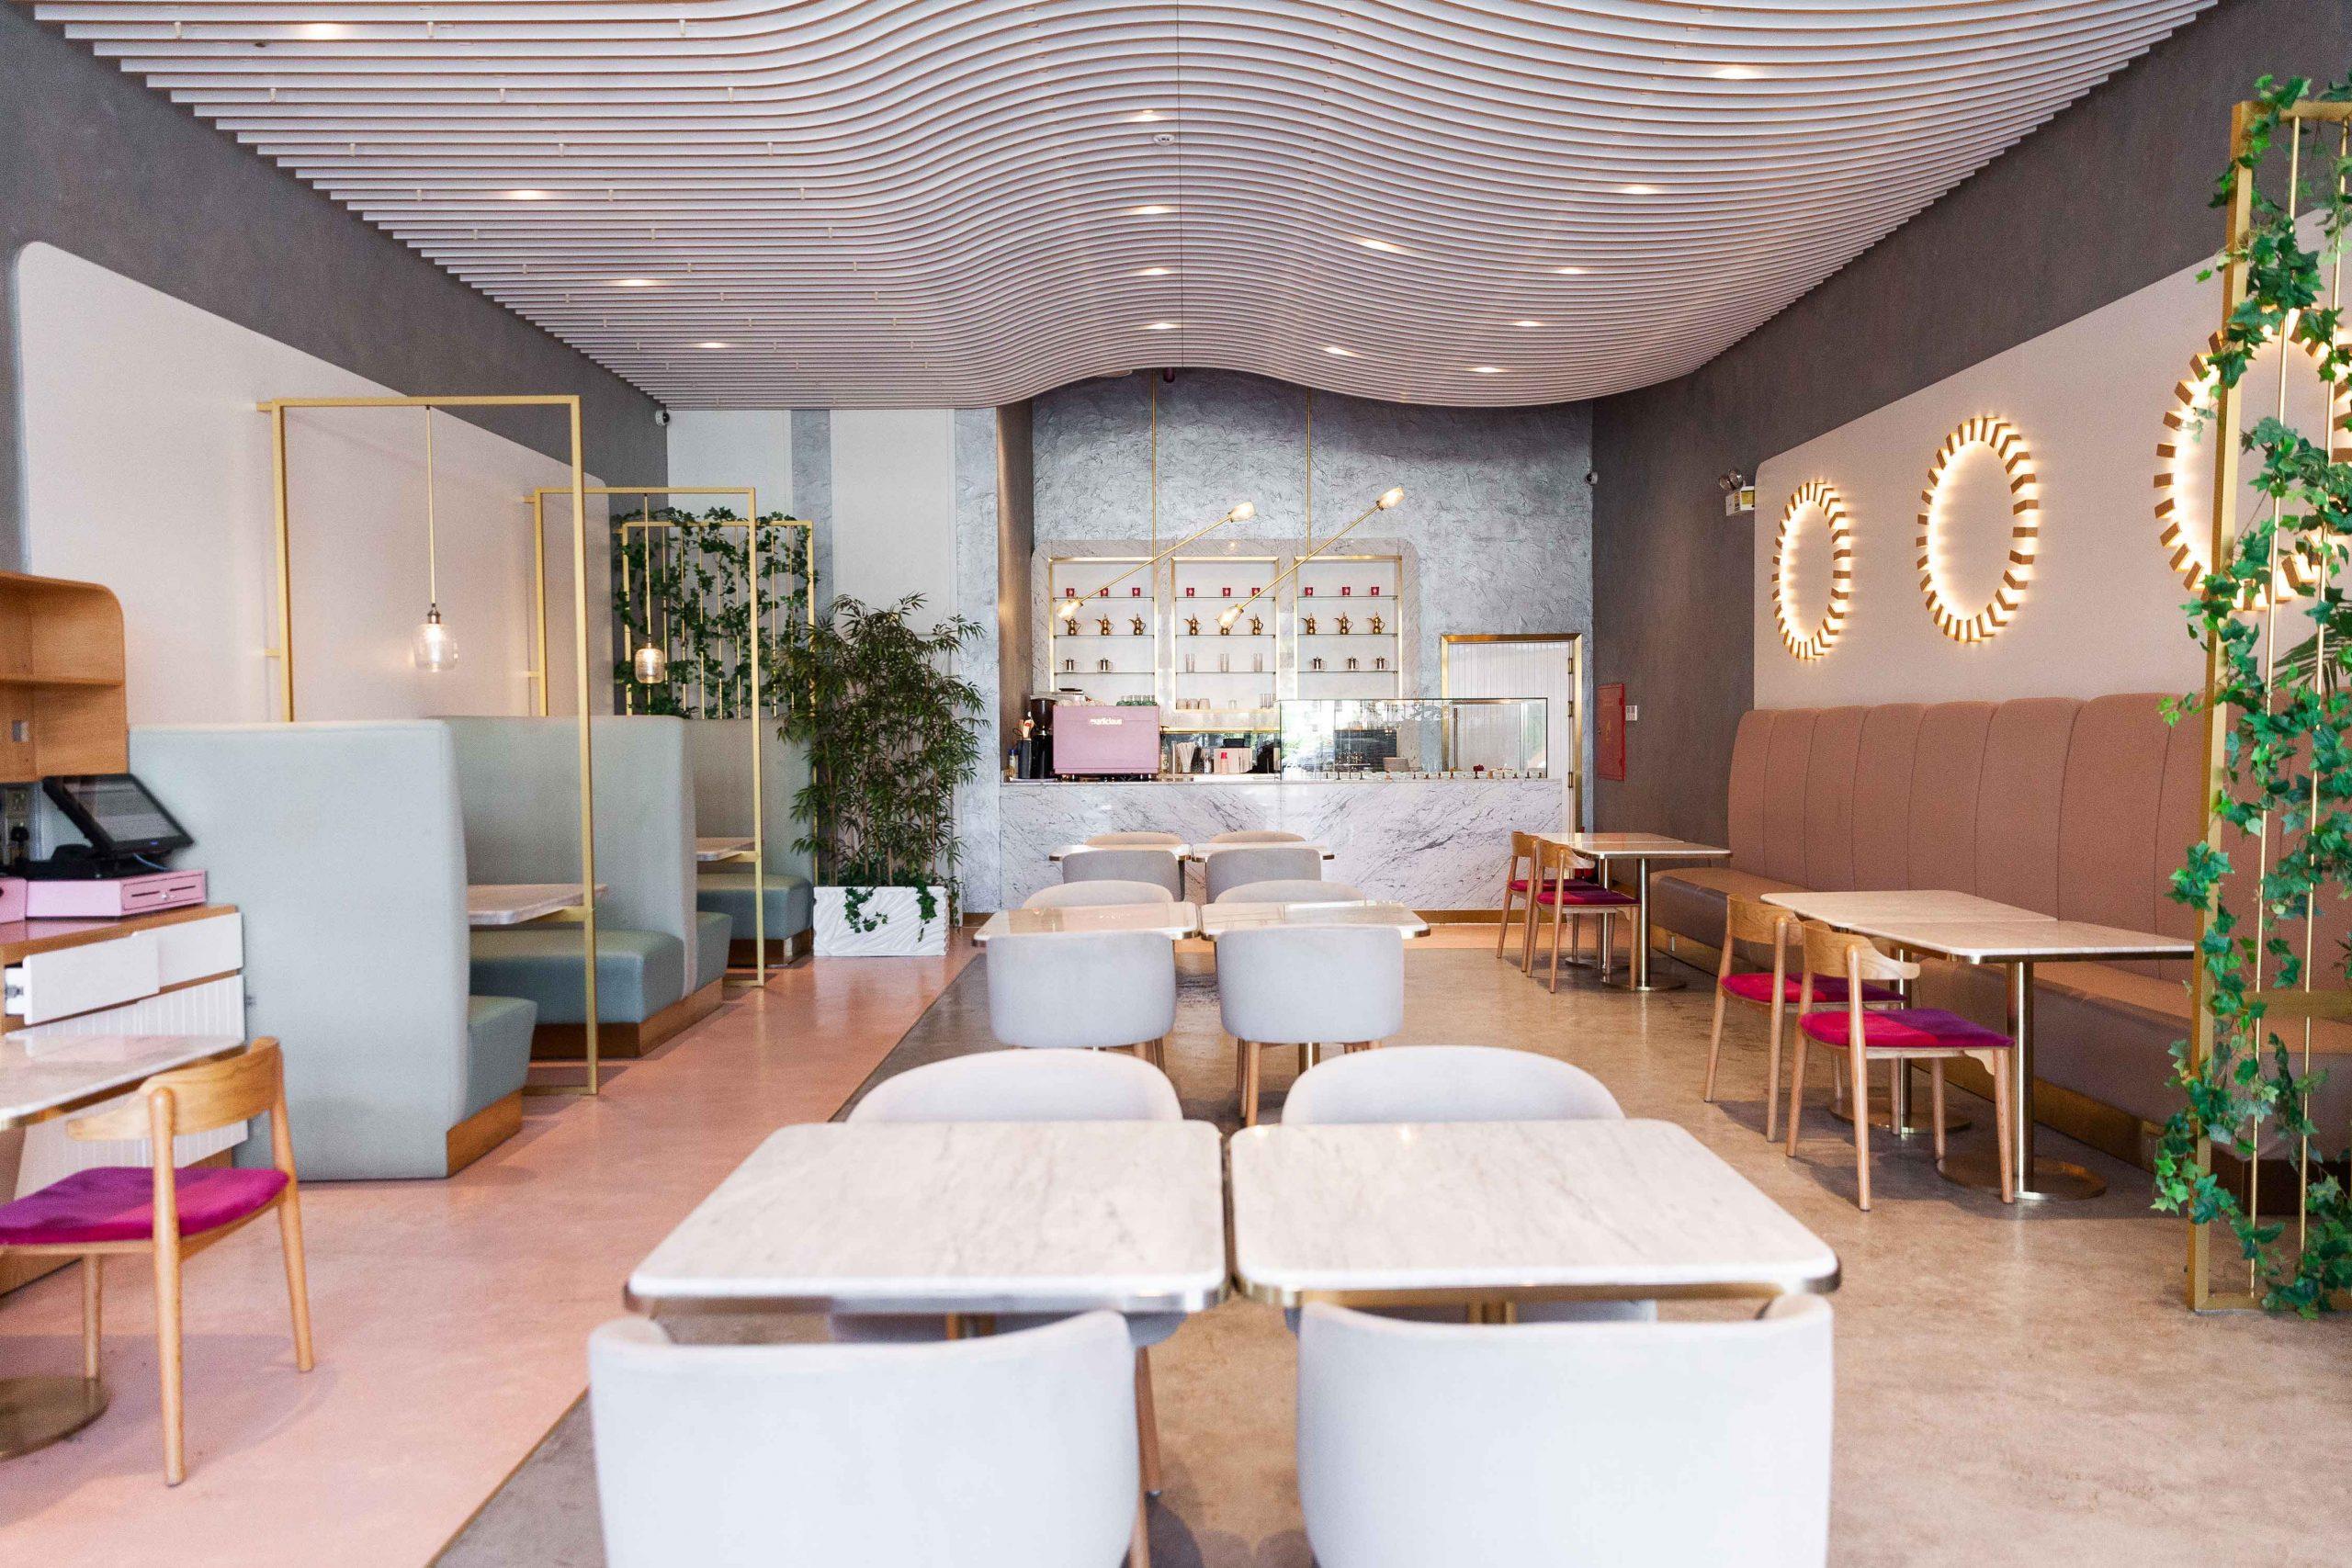 Jarlicious-Interior Design Company in Dubai